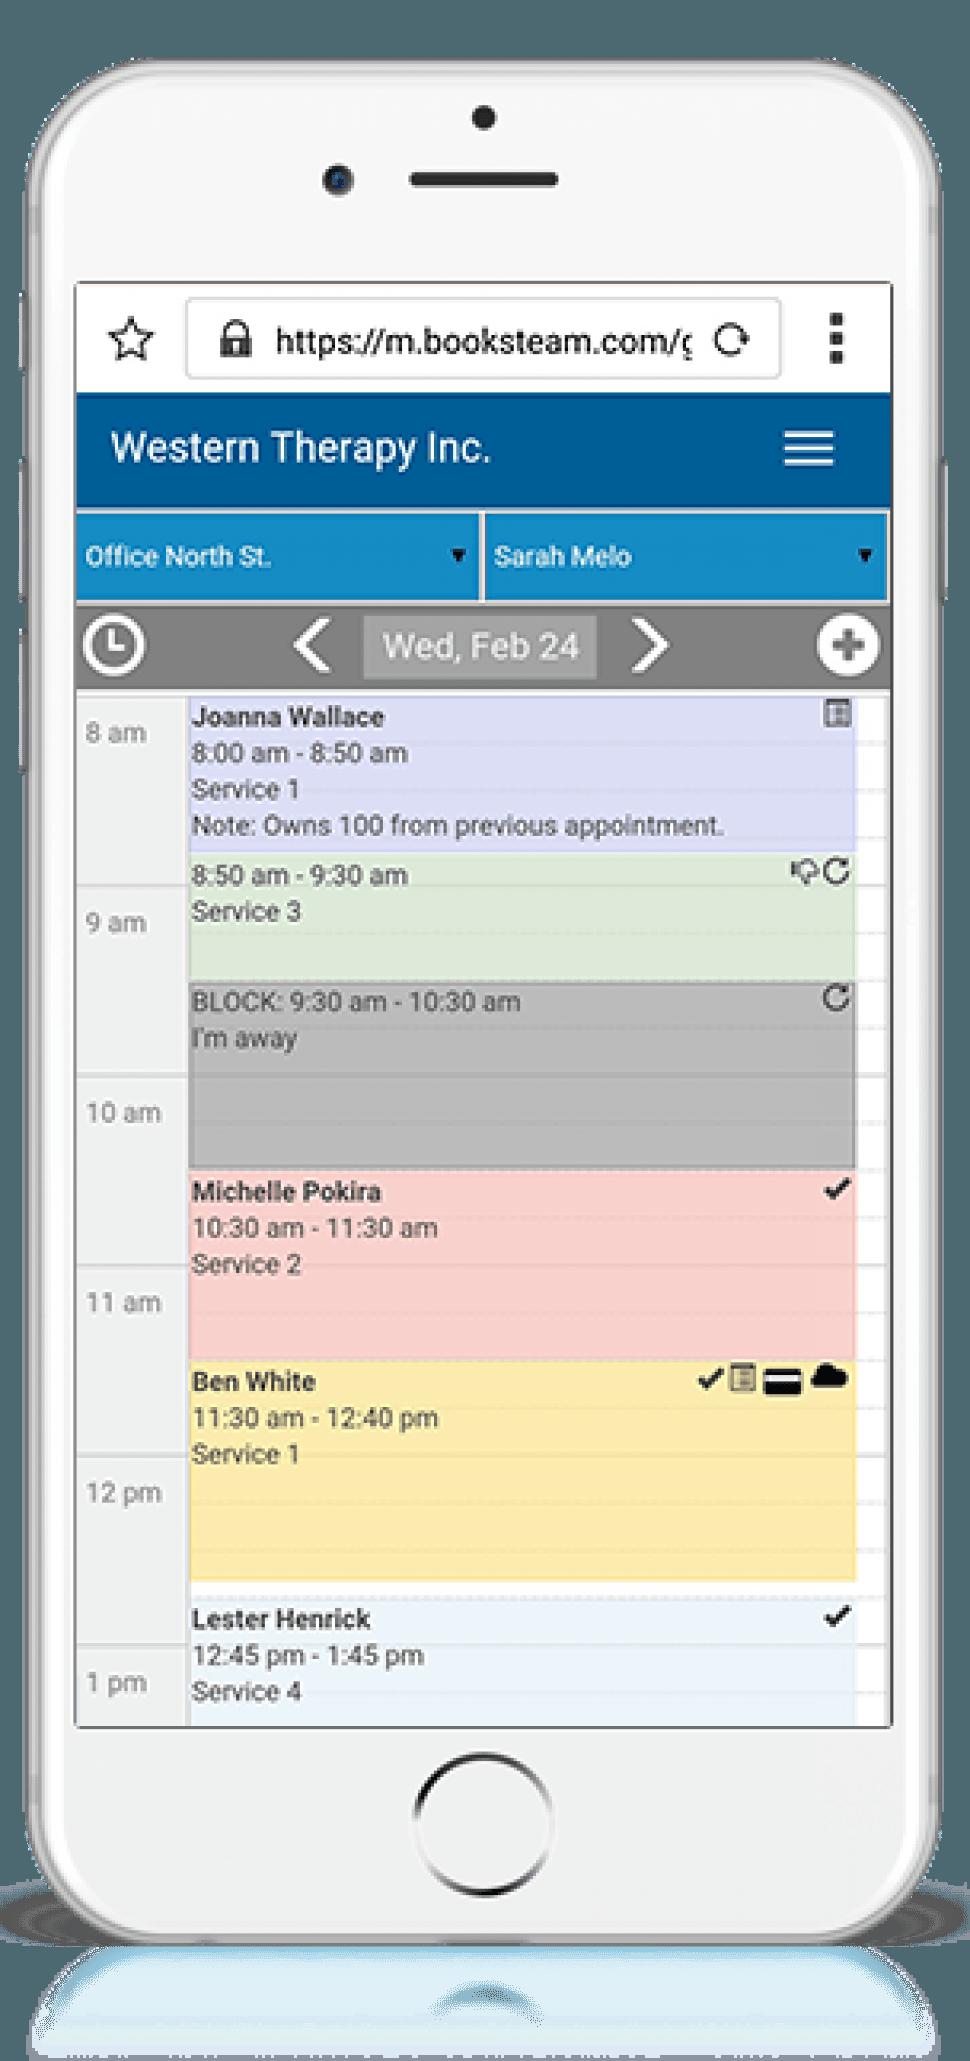 BookSteam Mobile calendar